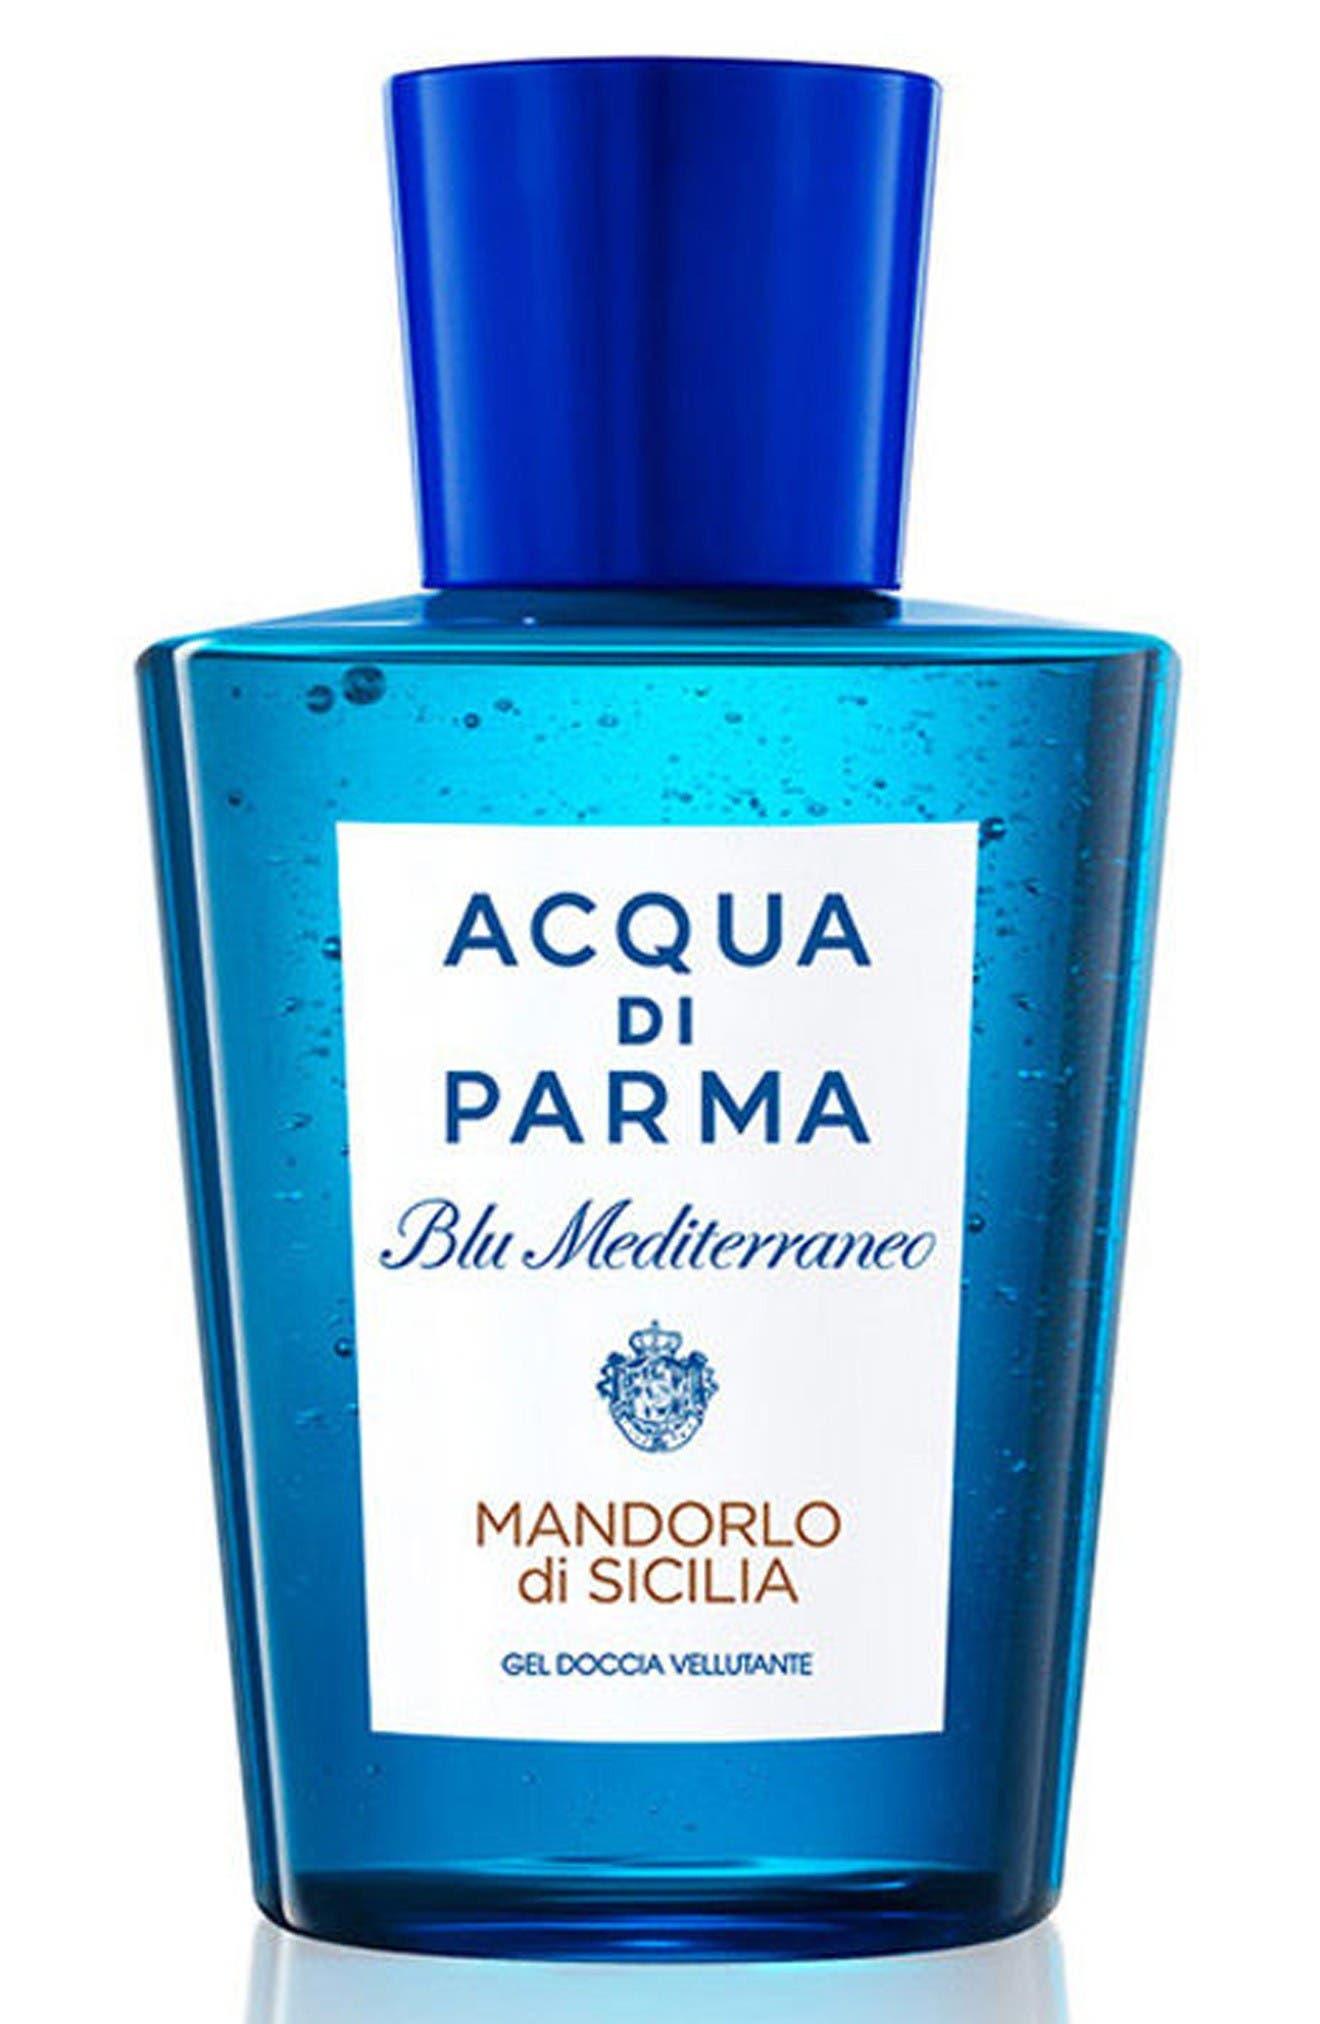 Alternate Image 1 Selected - Acqua di Parma 'Blu Mediterraneo - Mandorlo di Sicilia' Shower Gel